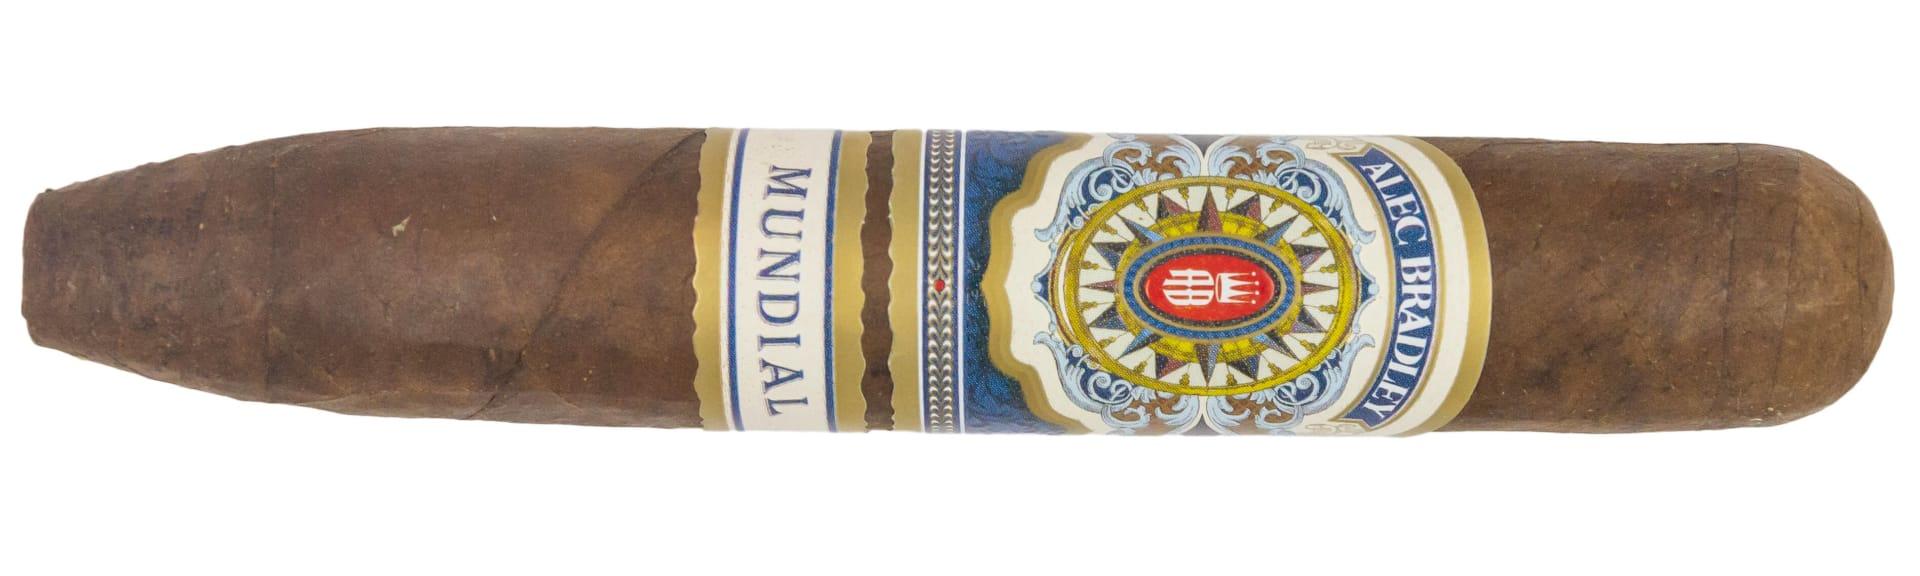 Blind Cigar Review: Alec Bradley | Mundial PL #5 Featured Image